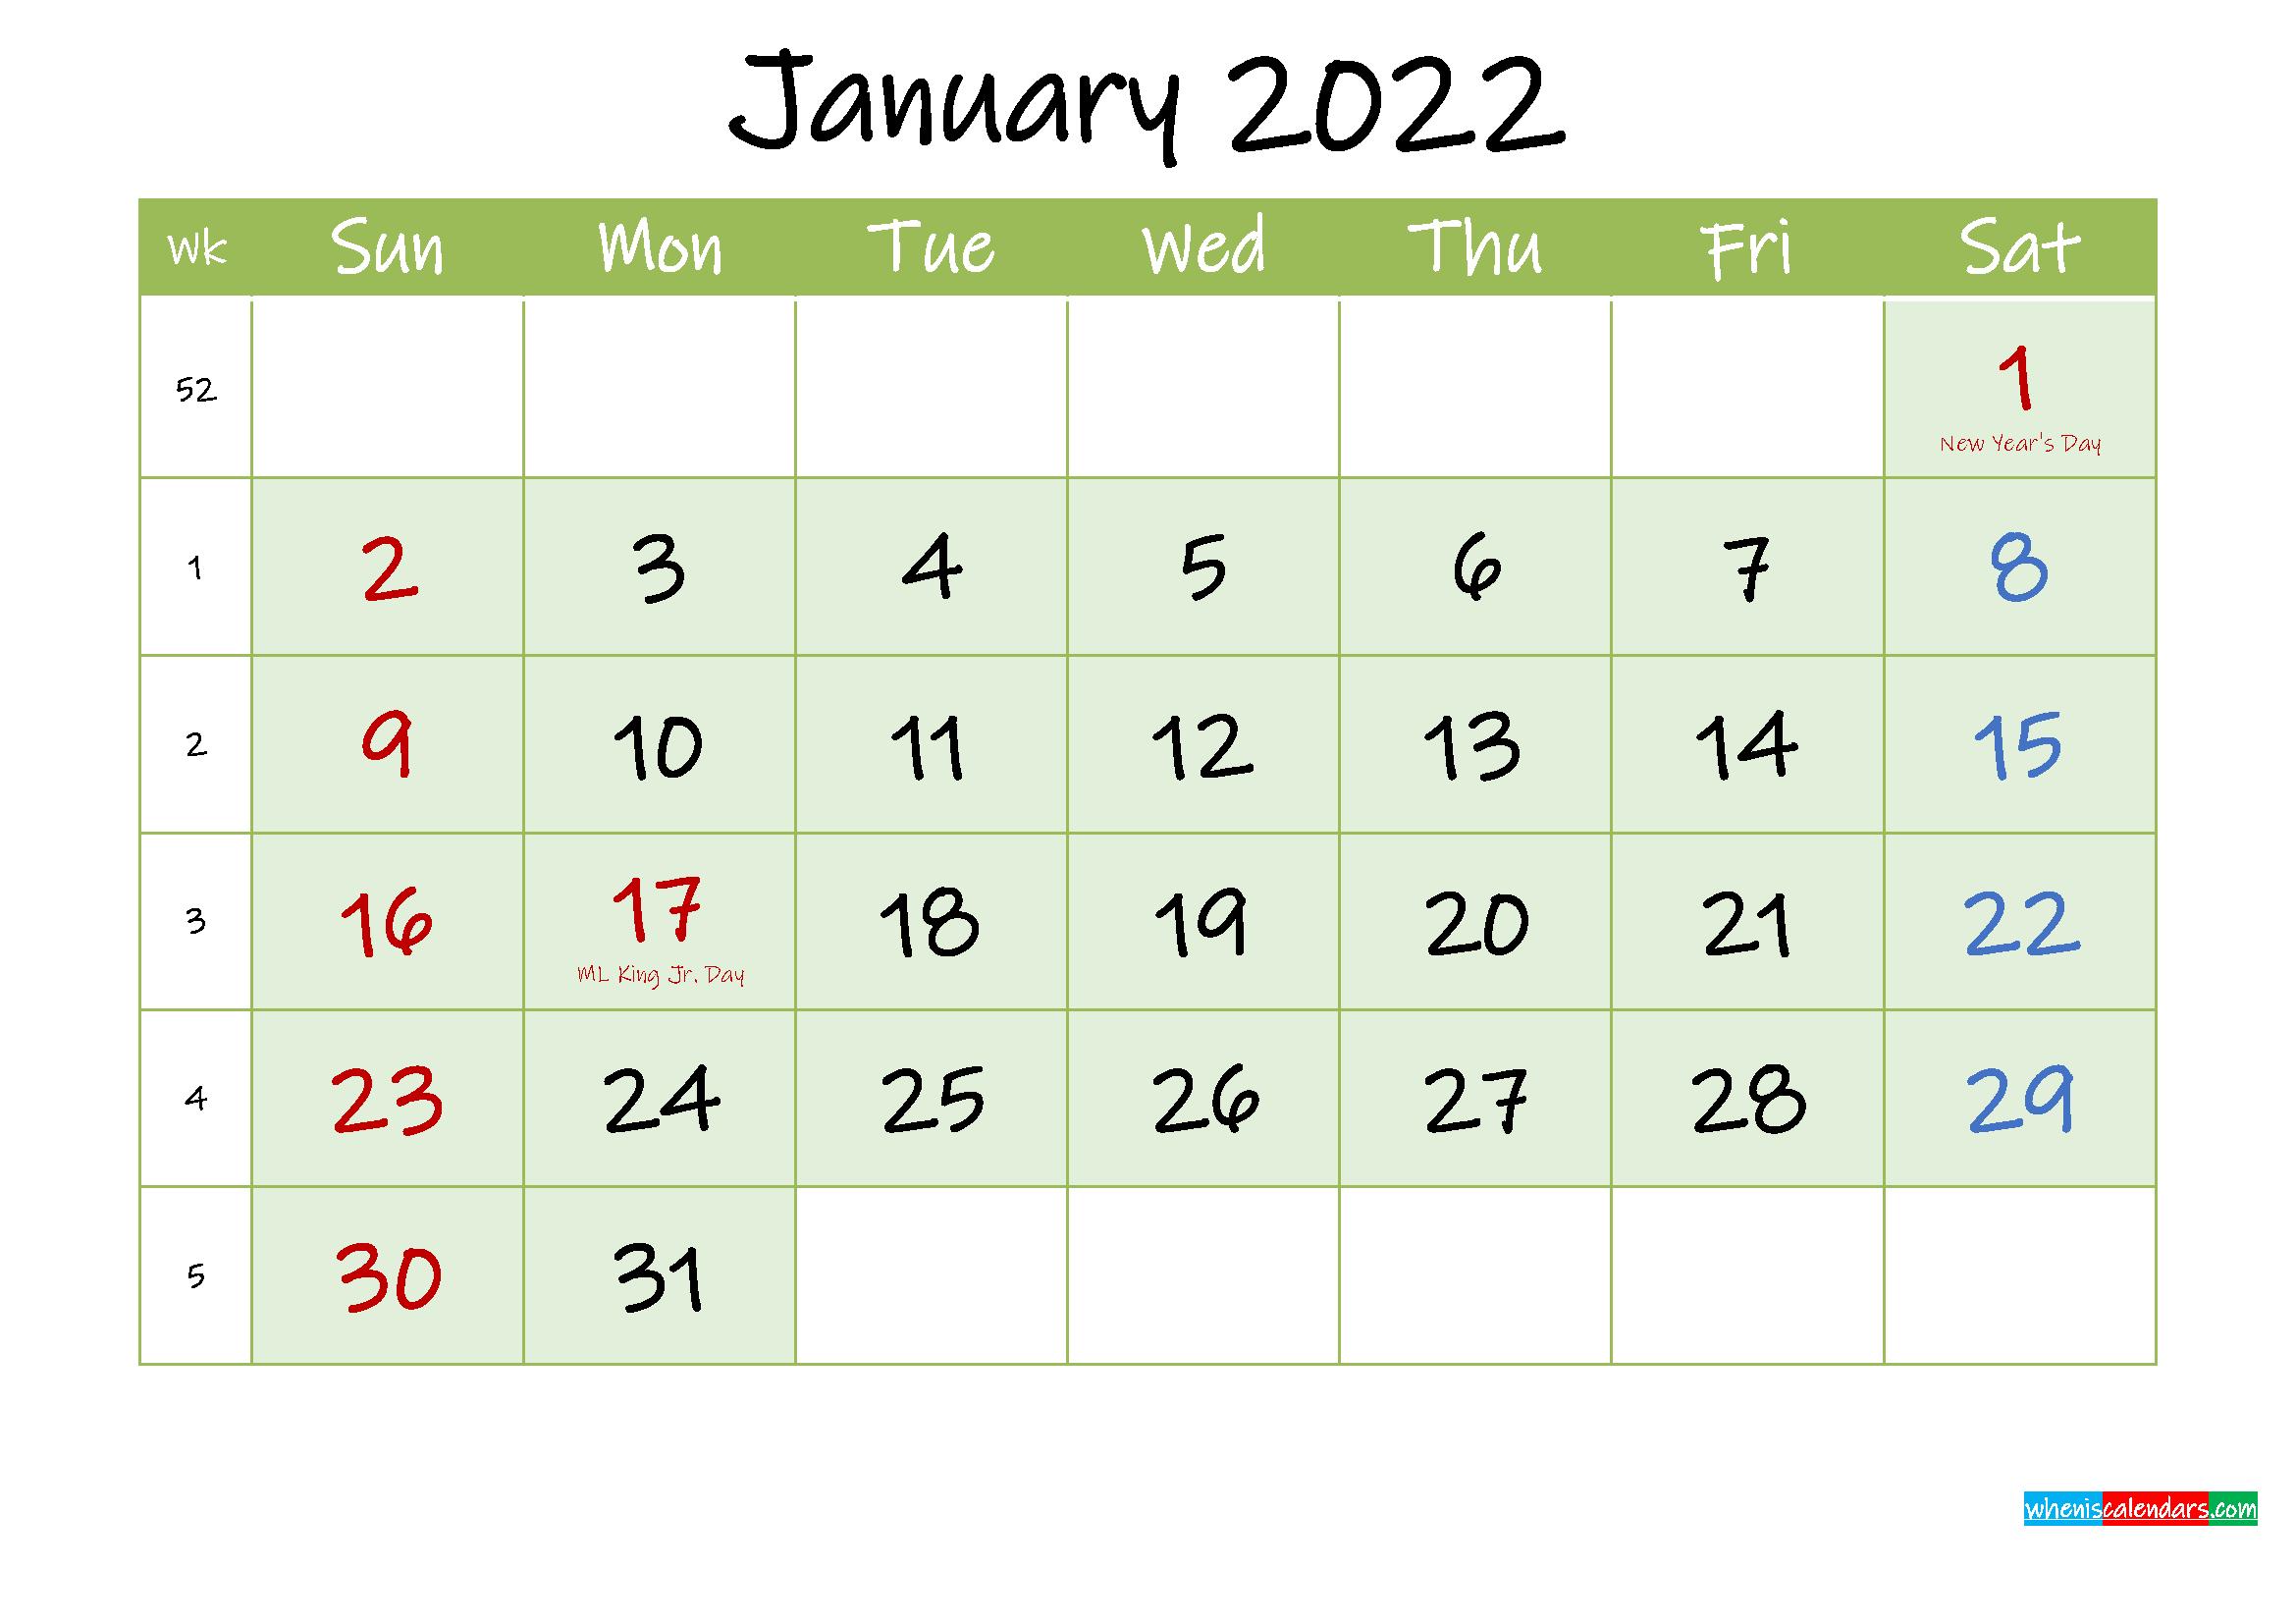 January 2022 Free Printable Calendar – Template Ink22M121 Throughout January 2022 Calendar Printable Free